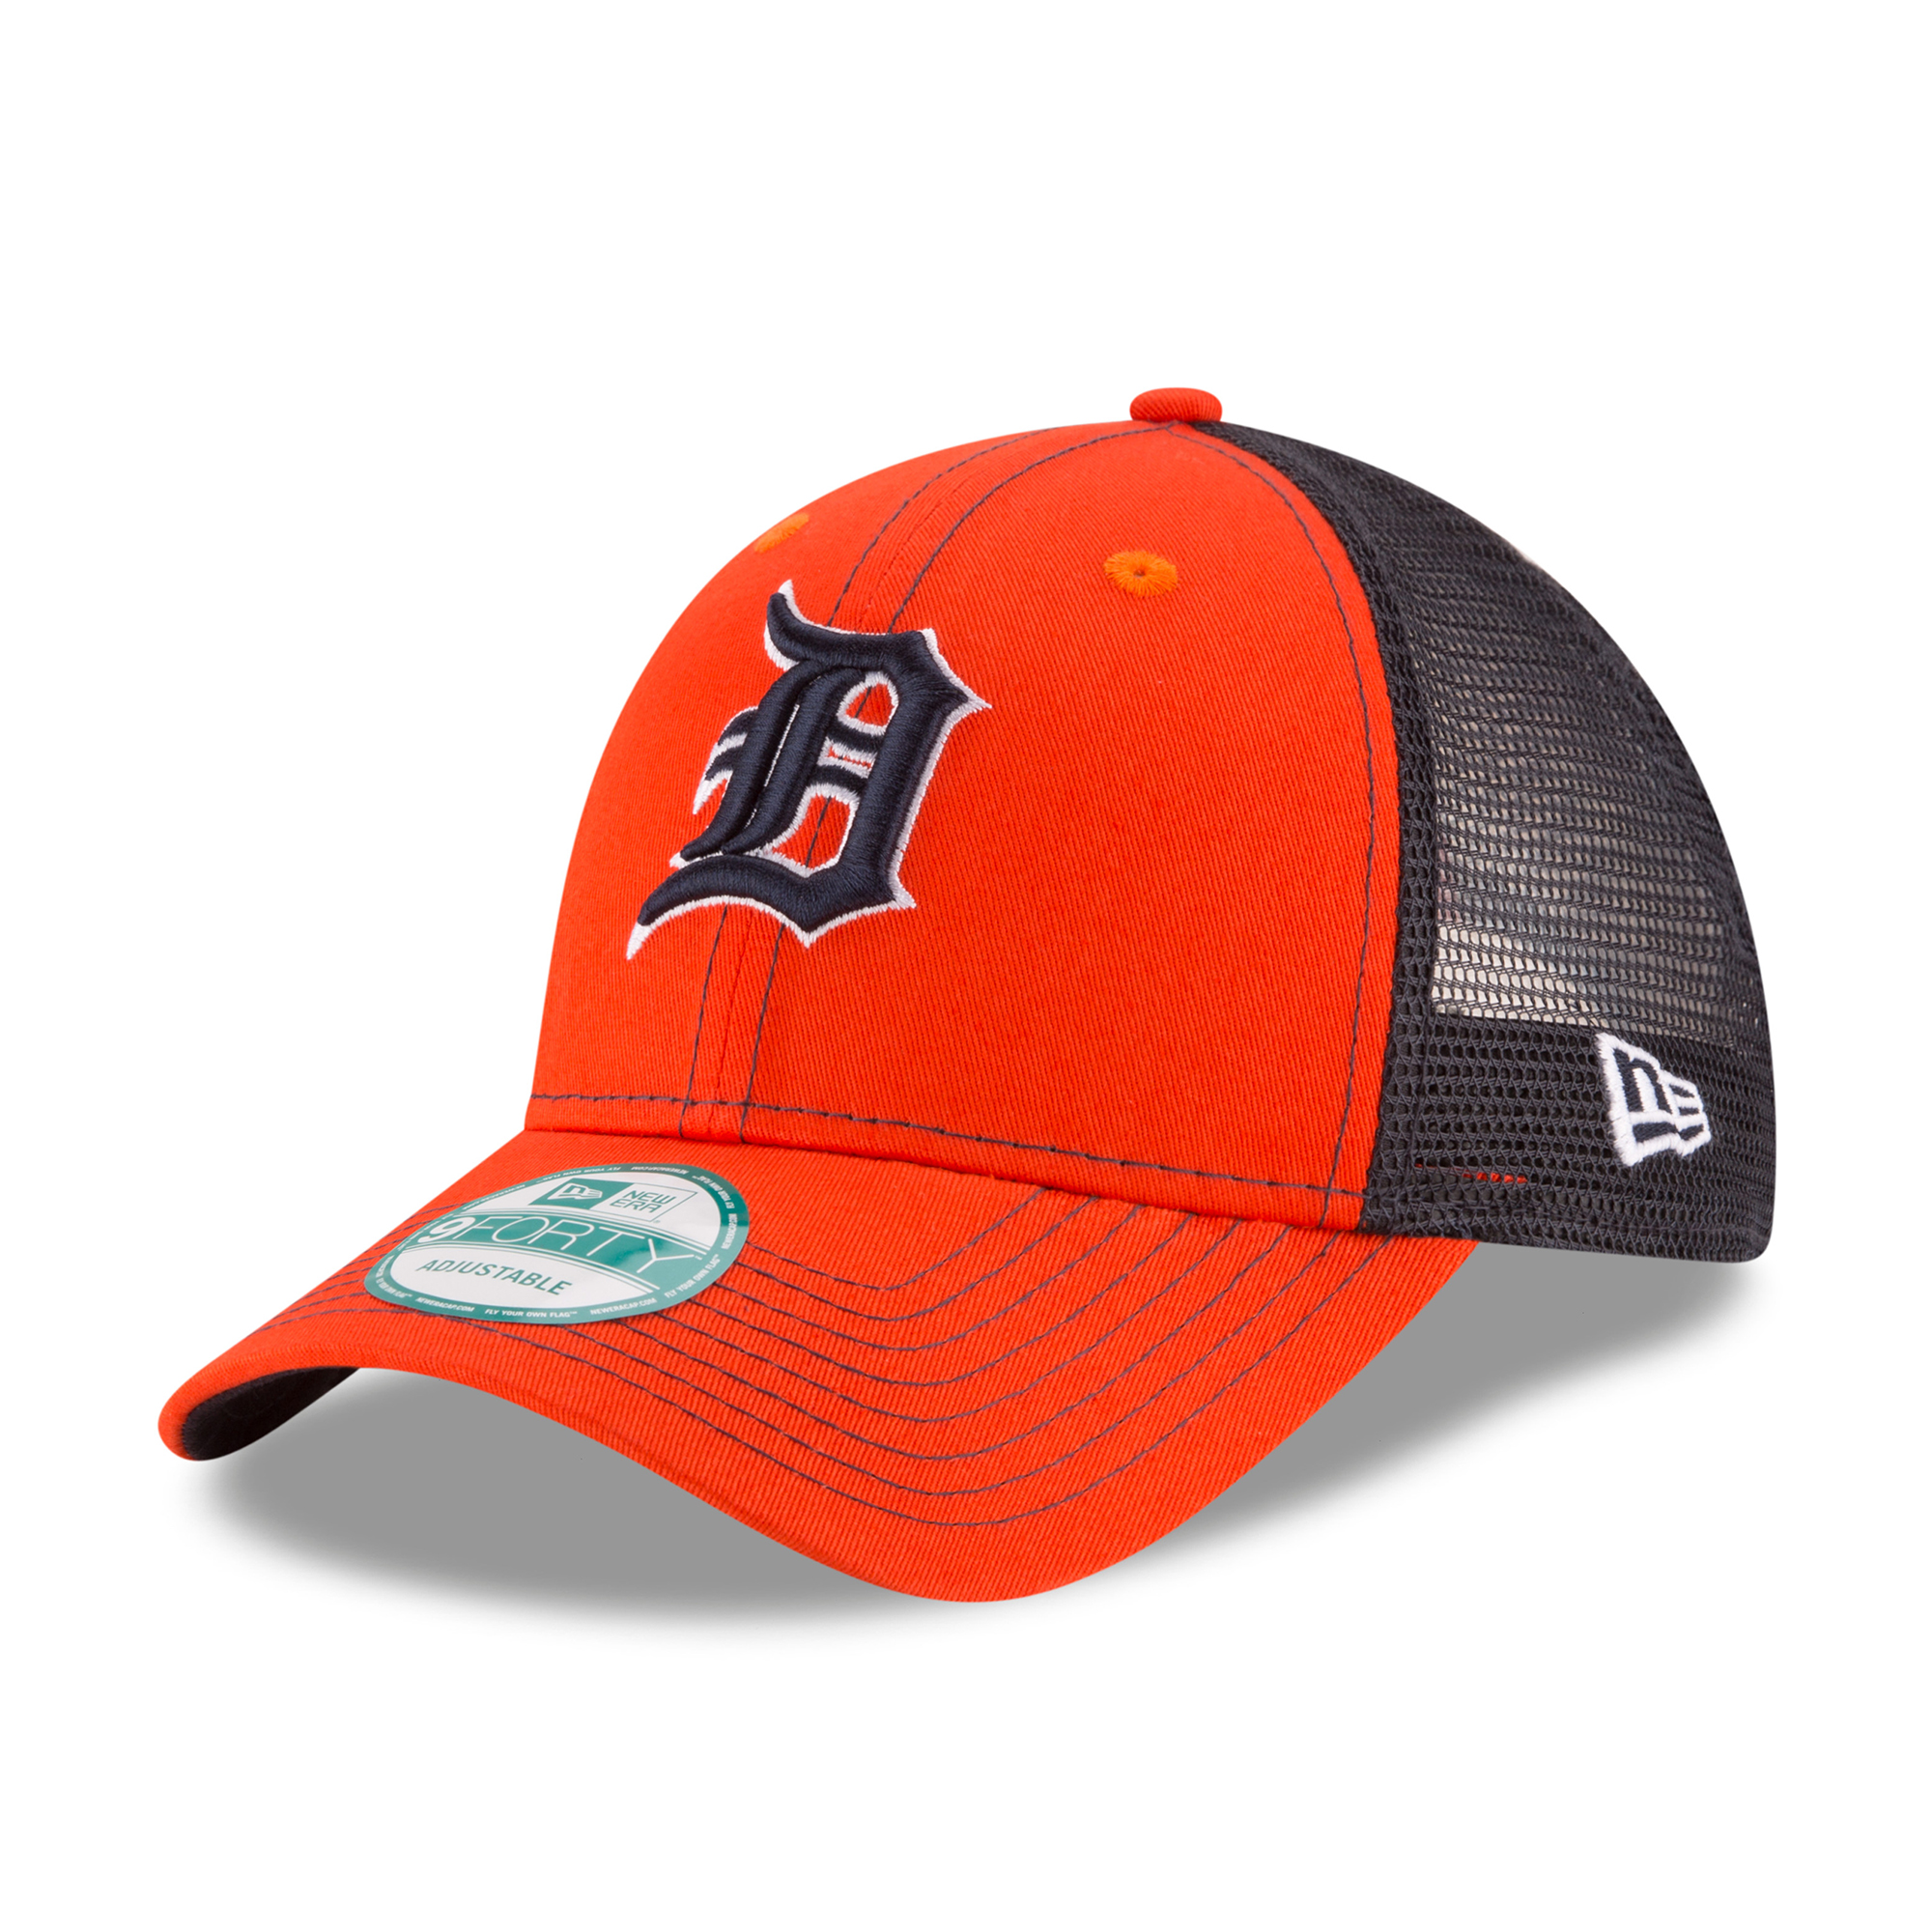 Detroit Tigers New Era Bold Mesher 9FORTY Adjustable Hat - Orange/Navy - OSFA